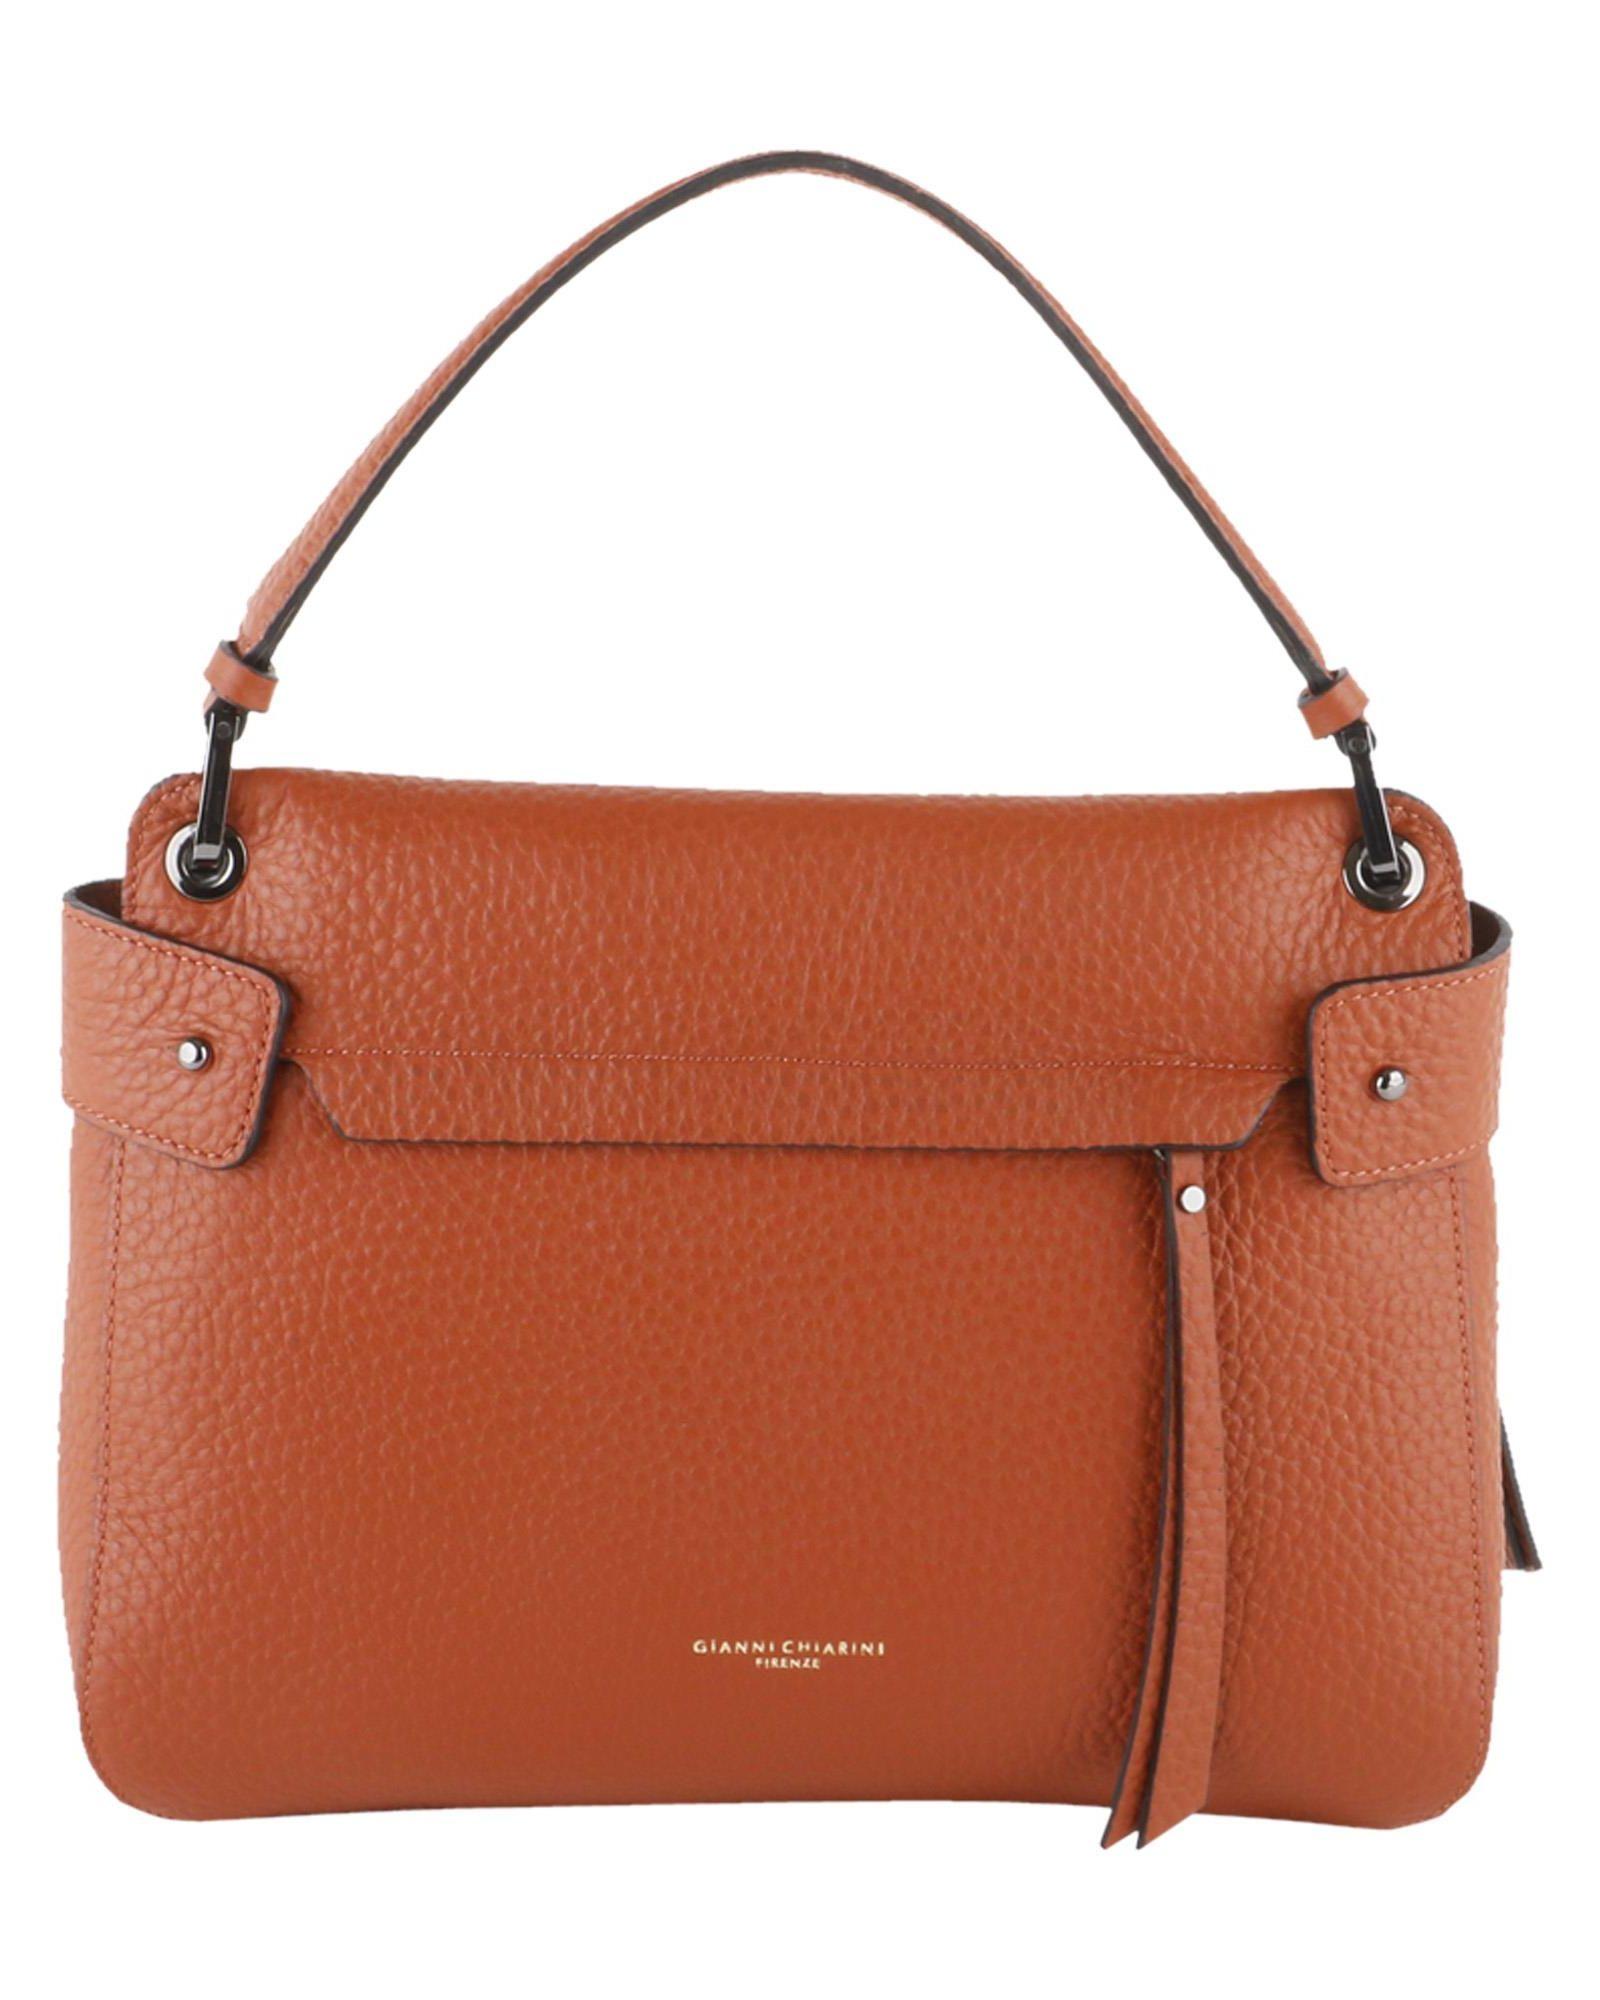 GIANNI CHIARINI Jasper Grained Leather Top Handle in Brown